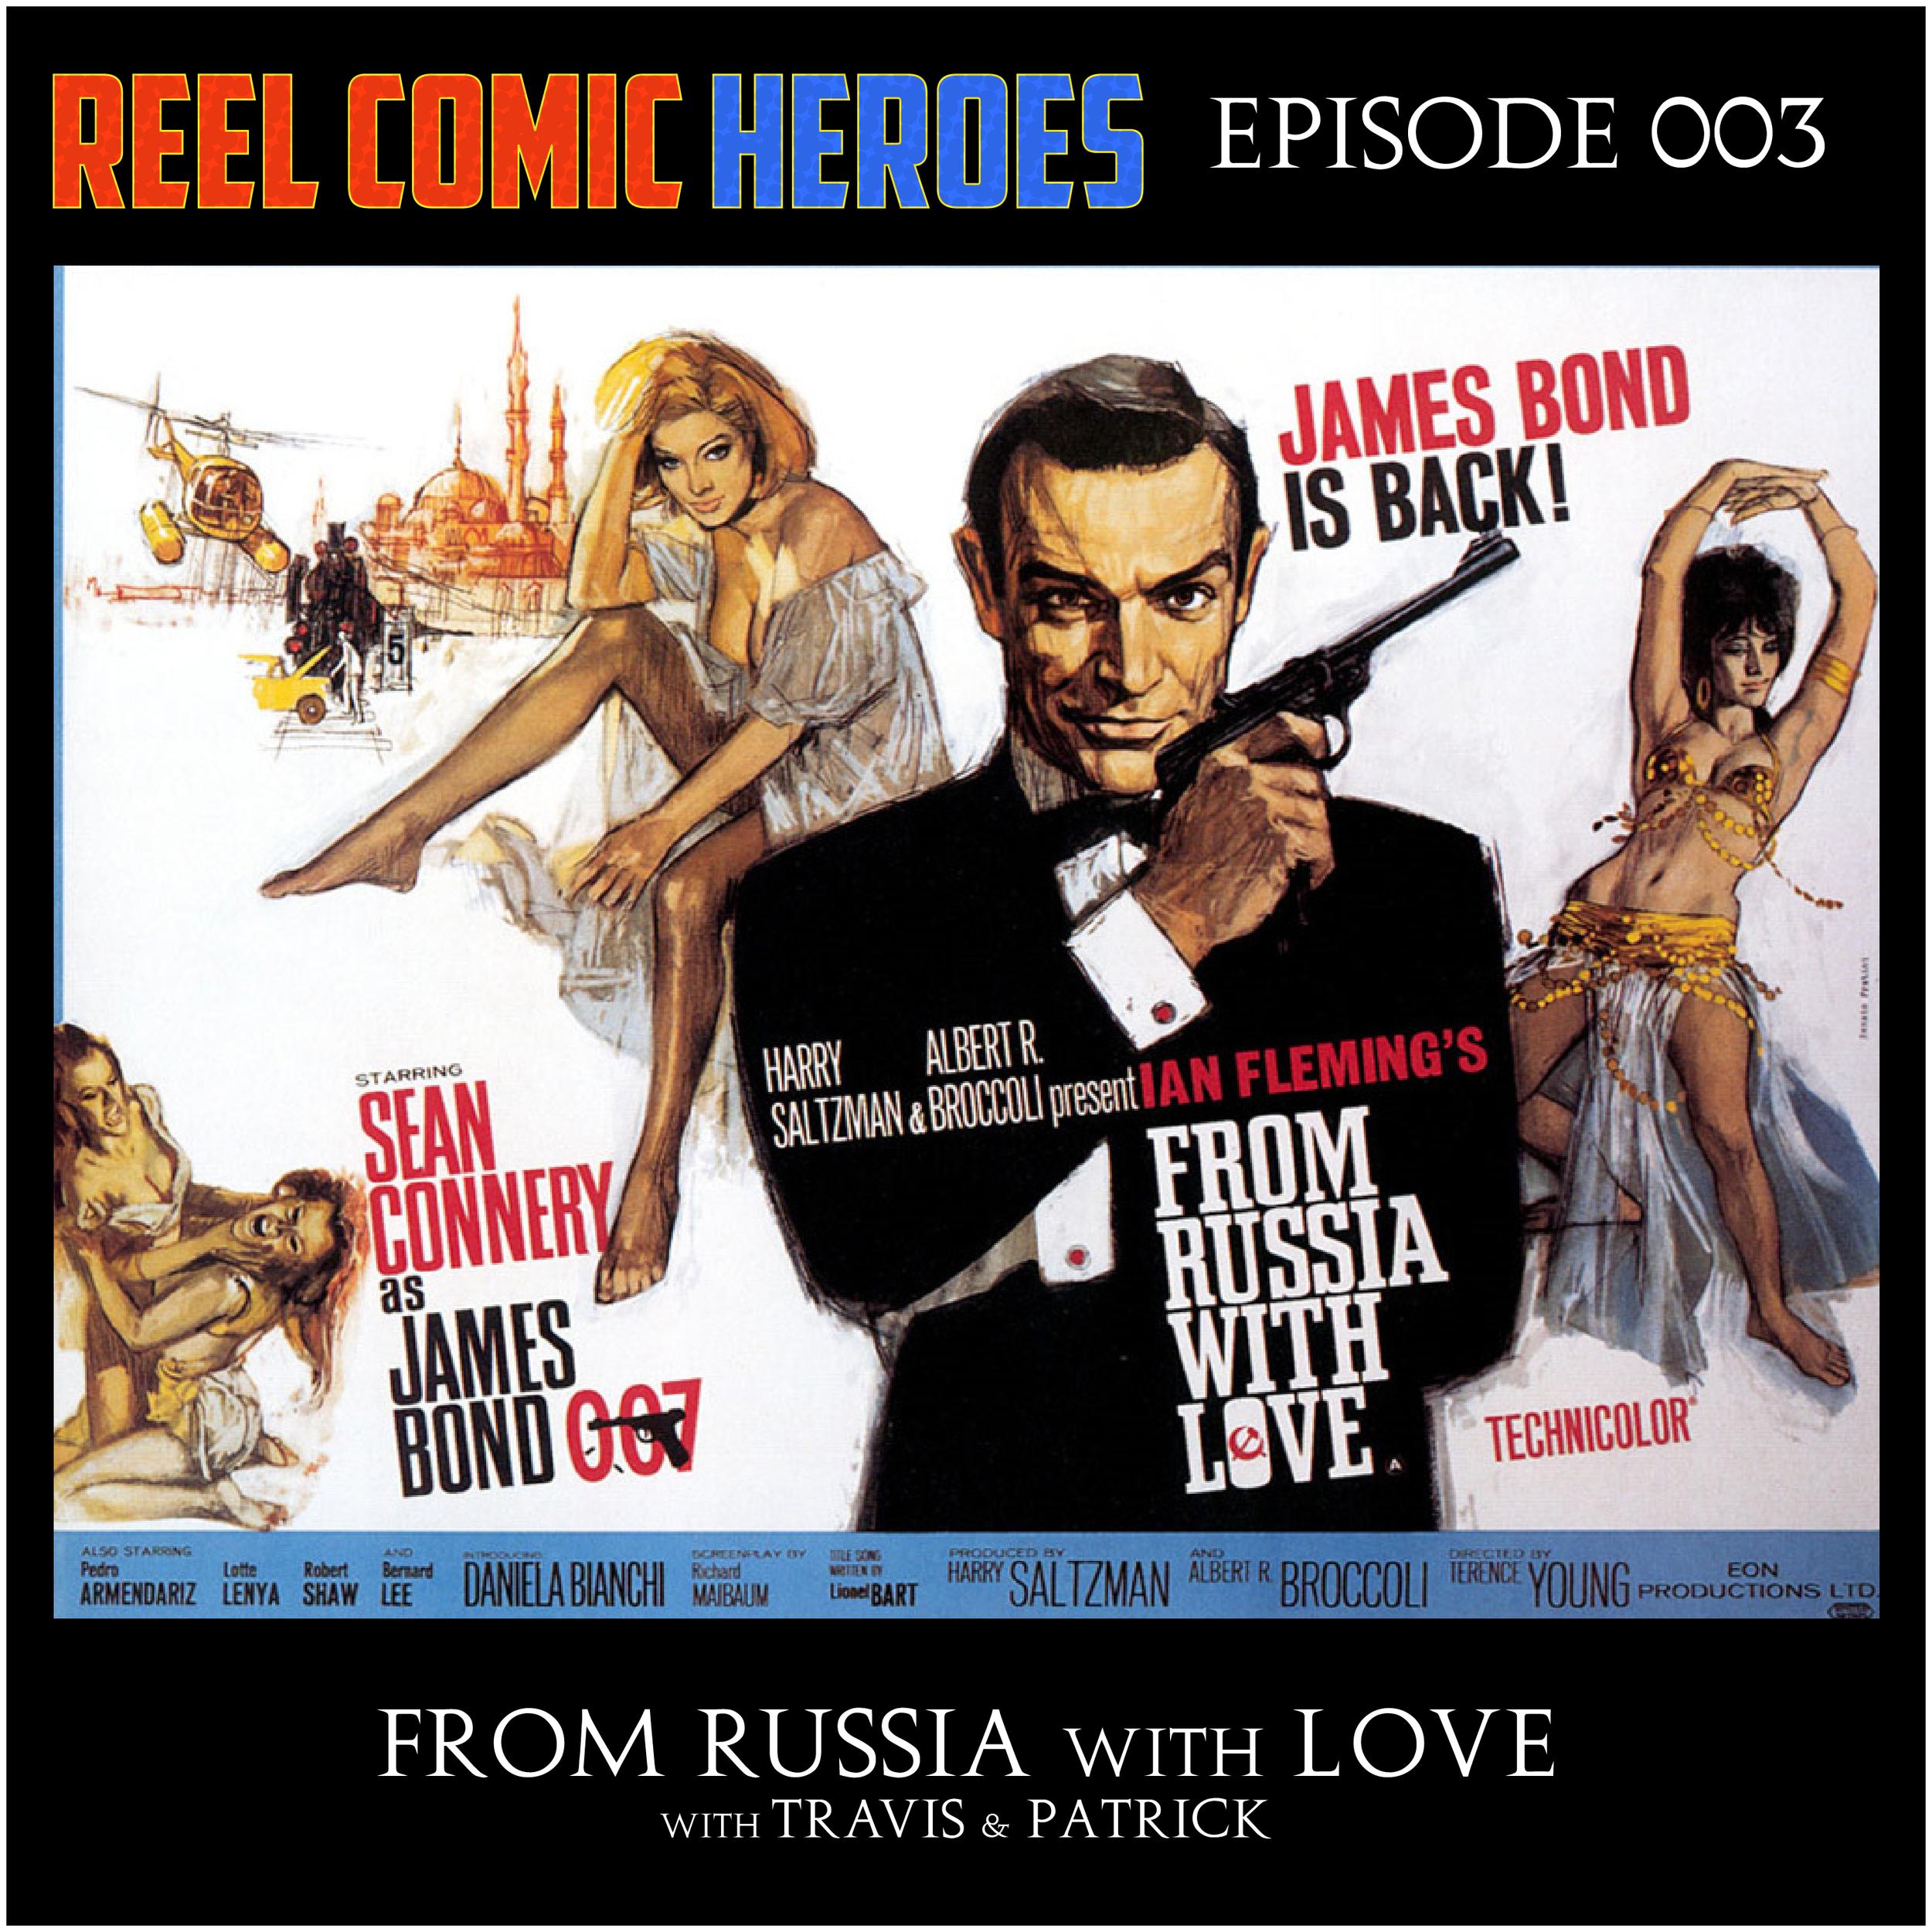 episode003_FromRussiaWithLove.jpg